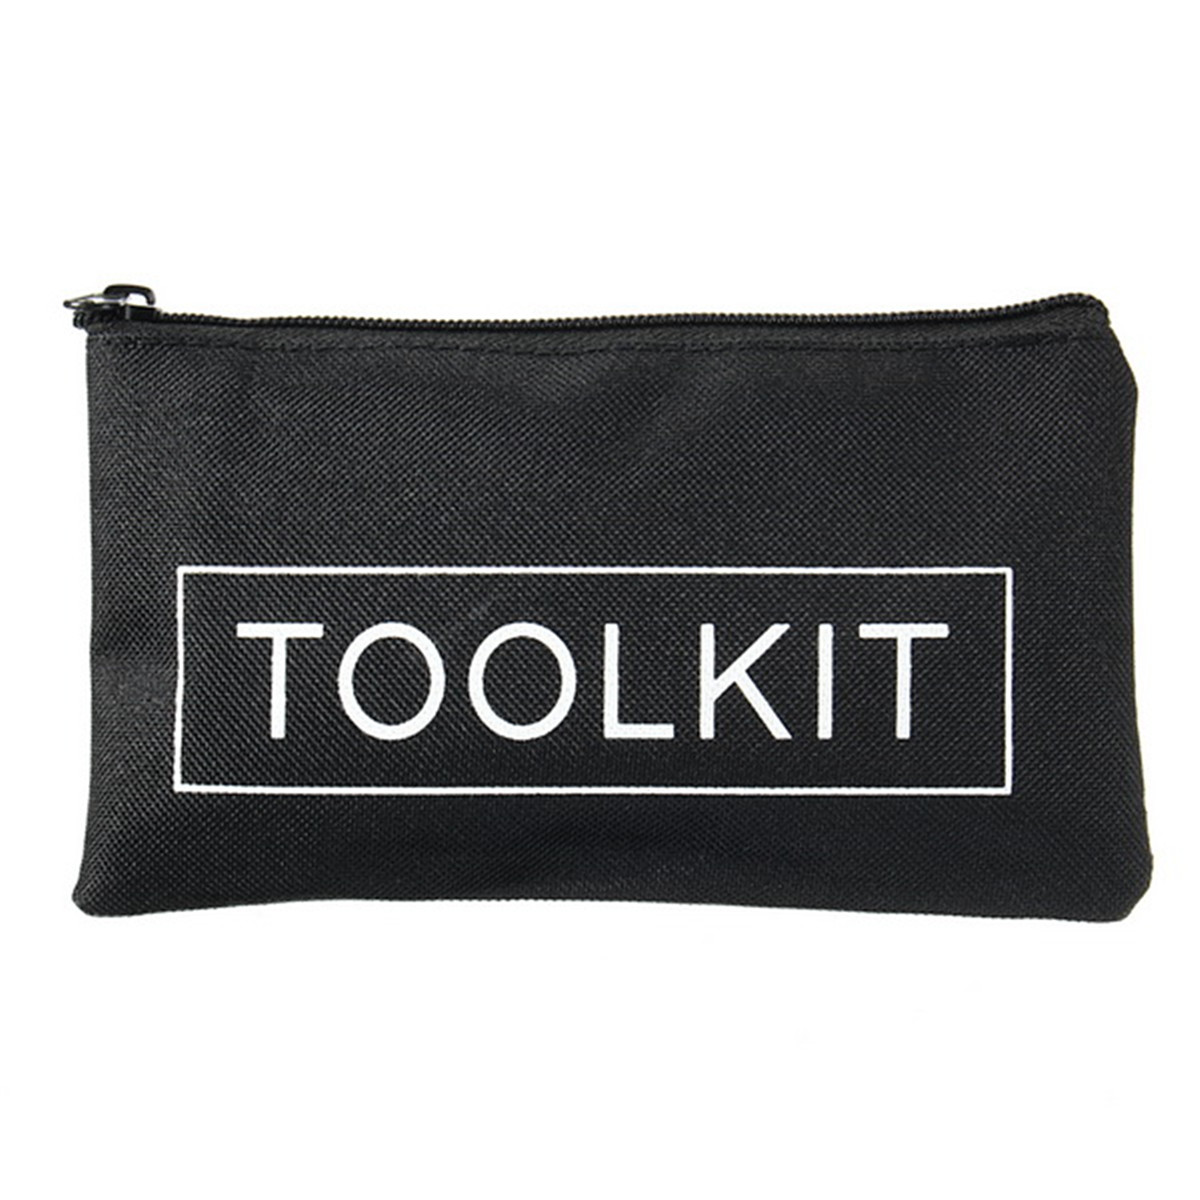 Cloth Tool Bag Electrician Tools Kit Solder Bags Soldering Pocket Repair Chisel Maintenance Repairing Easy Carry Pouch